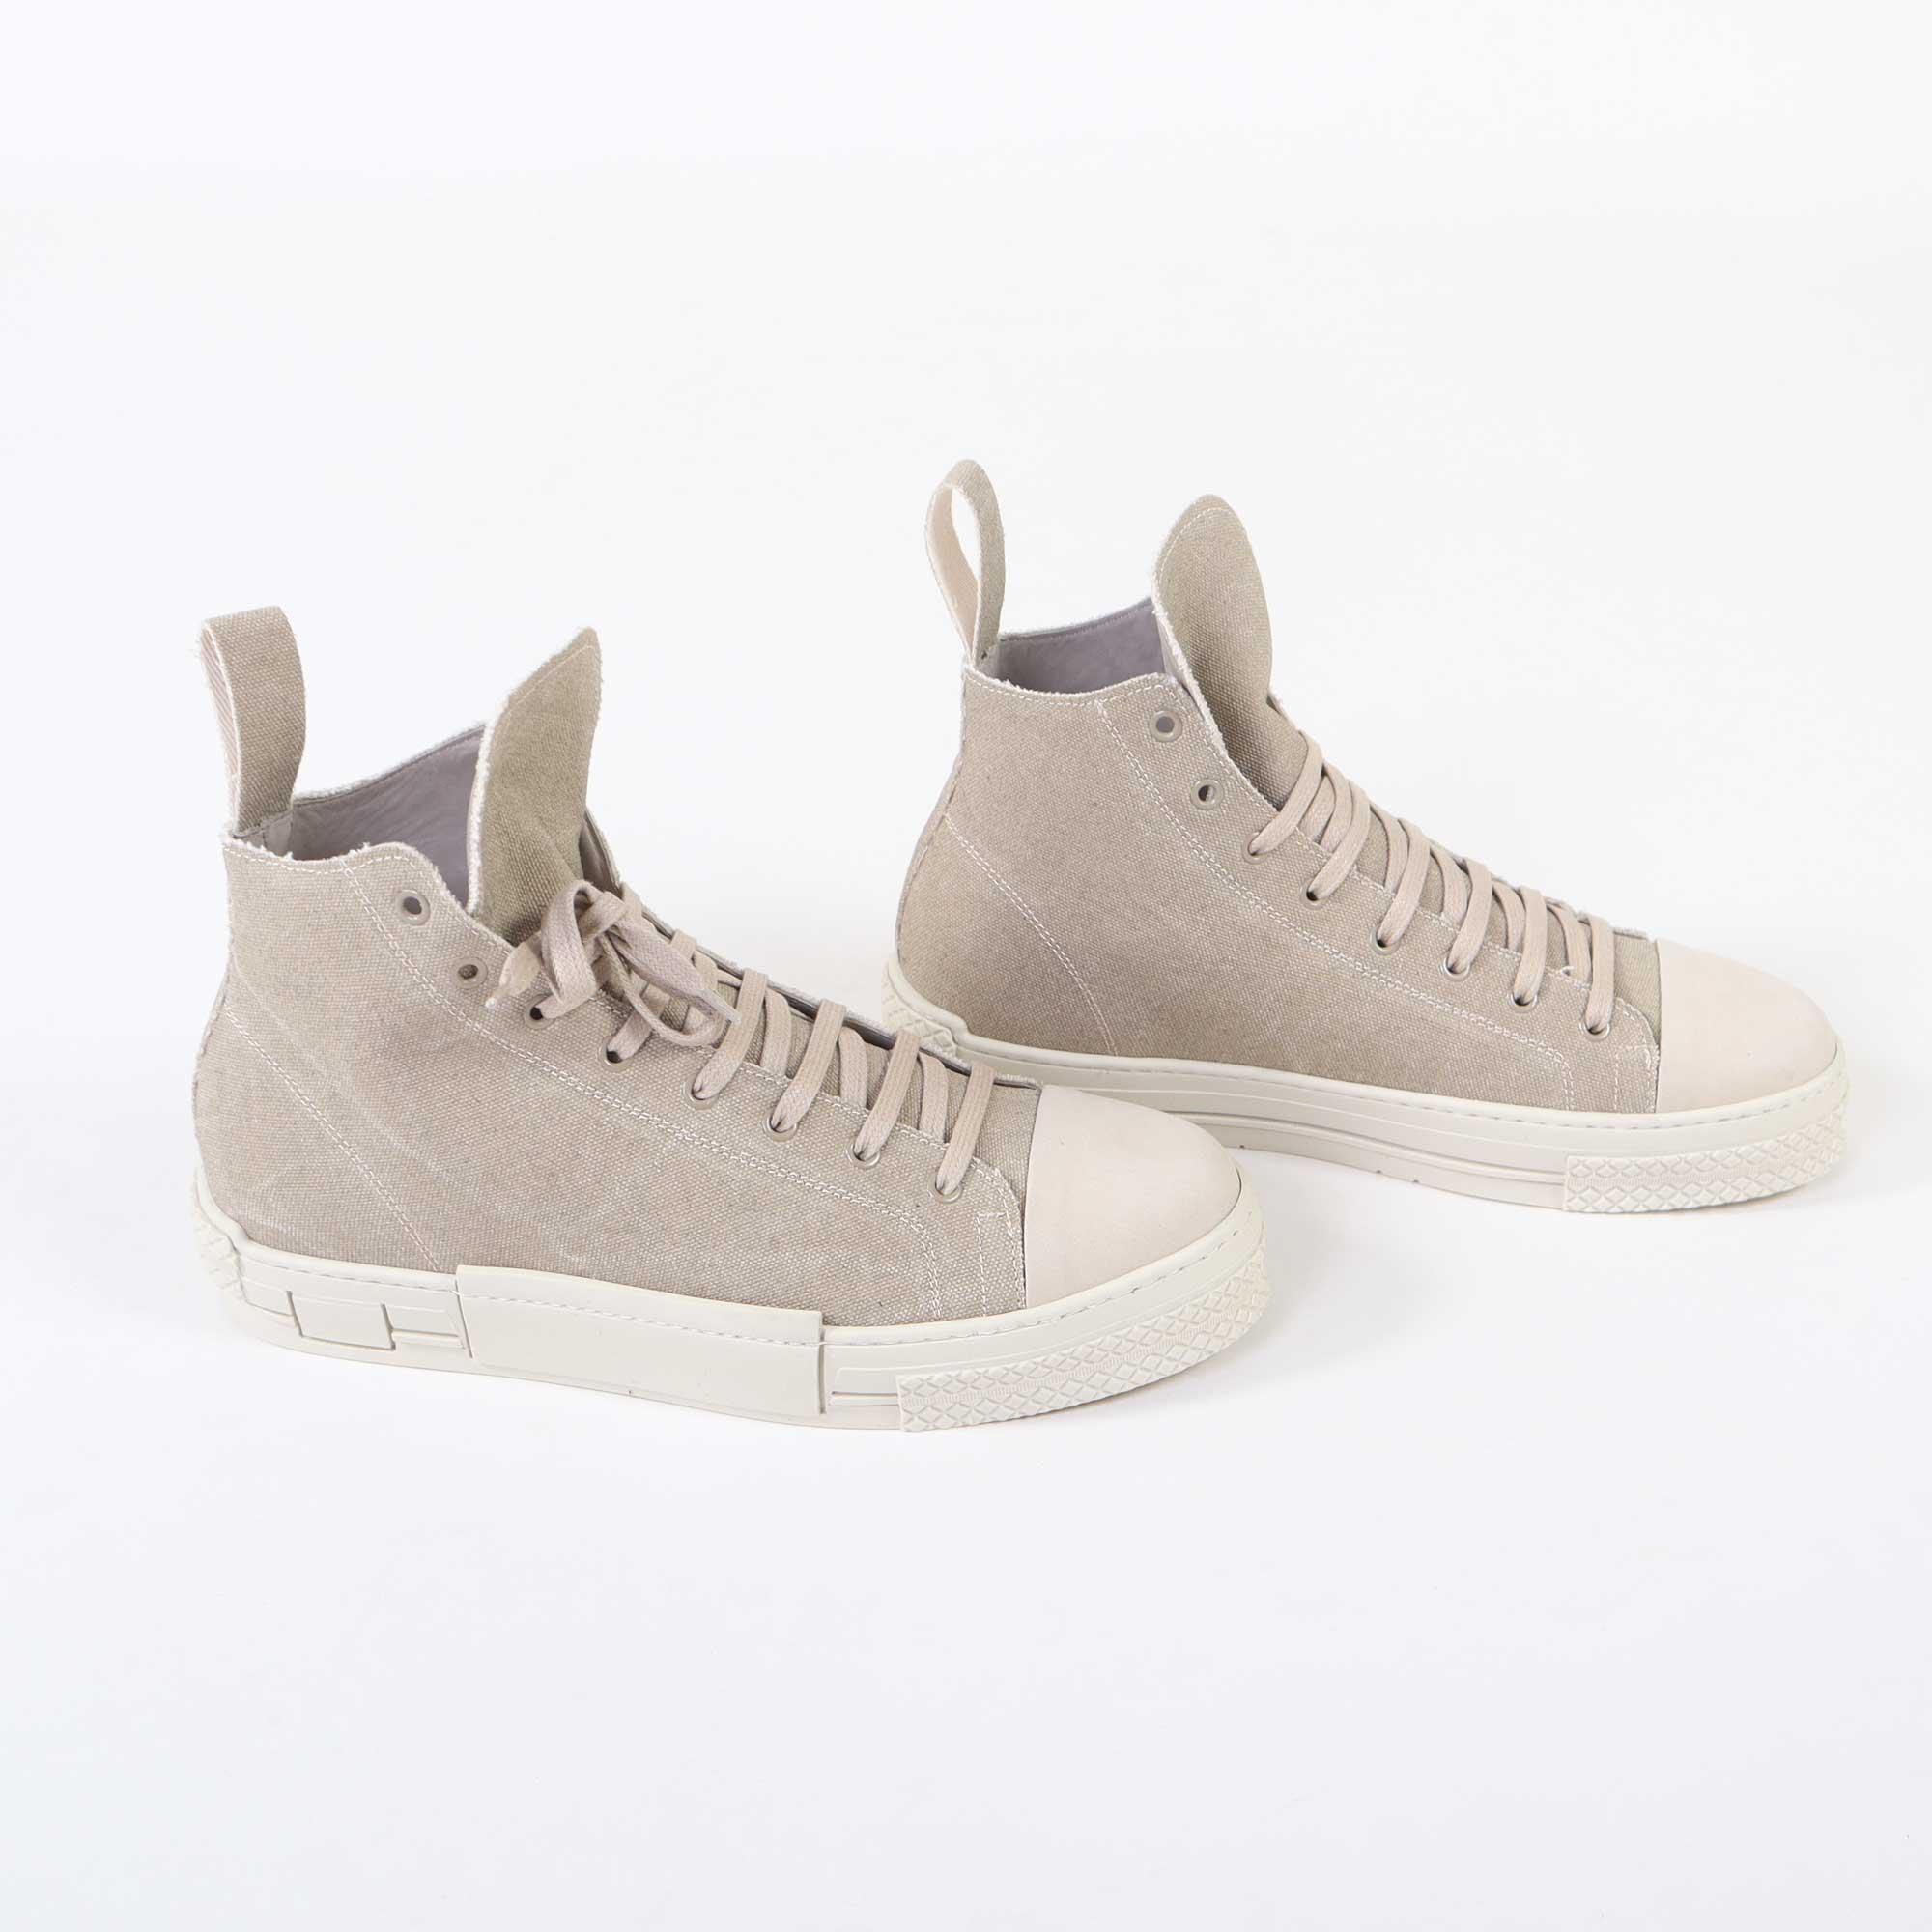 sneakers-beige-2